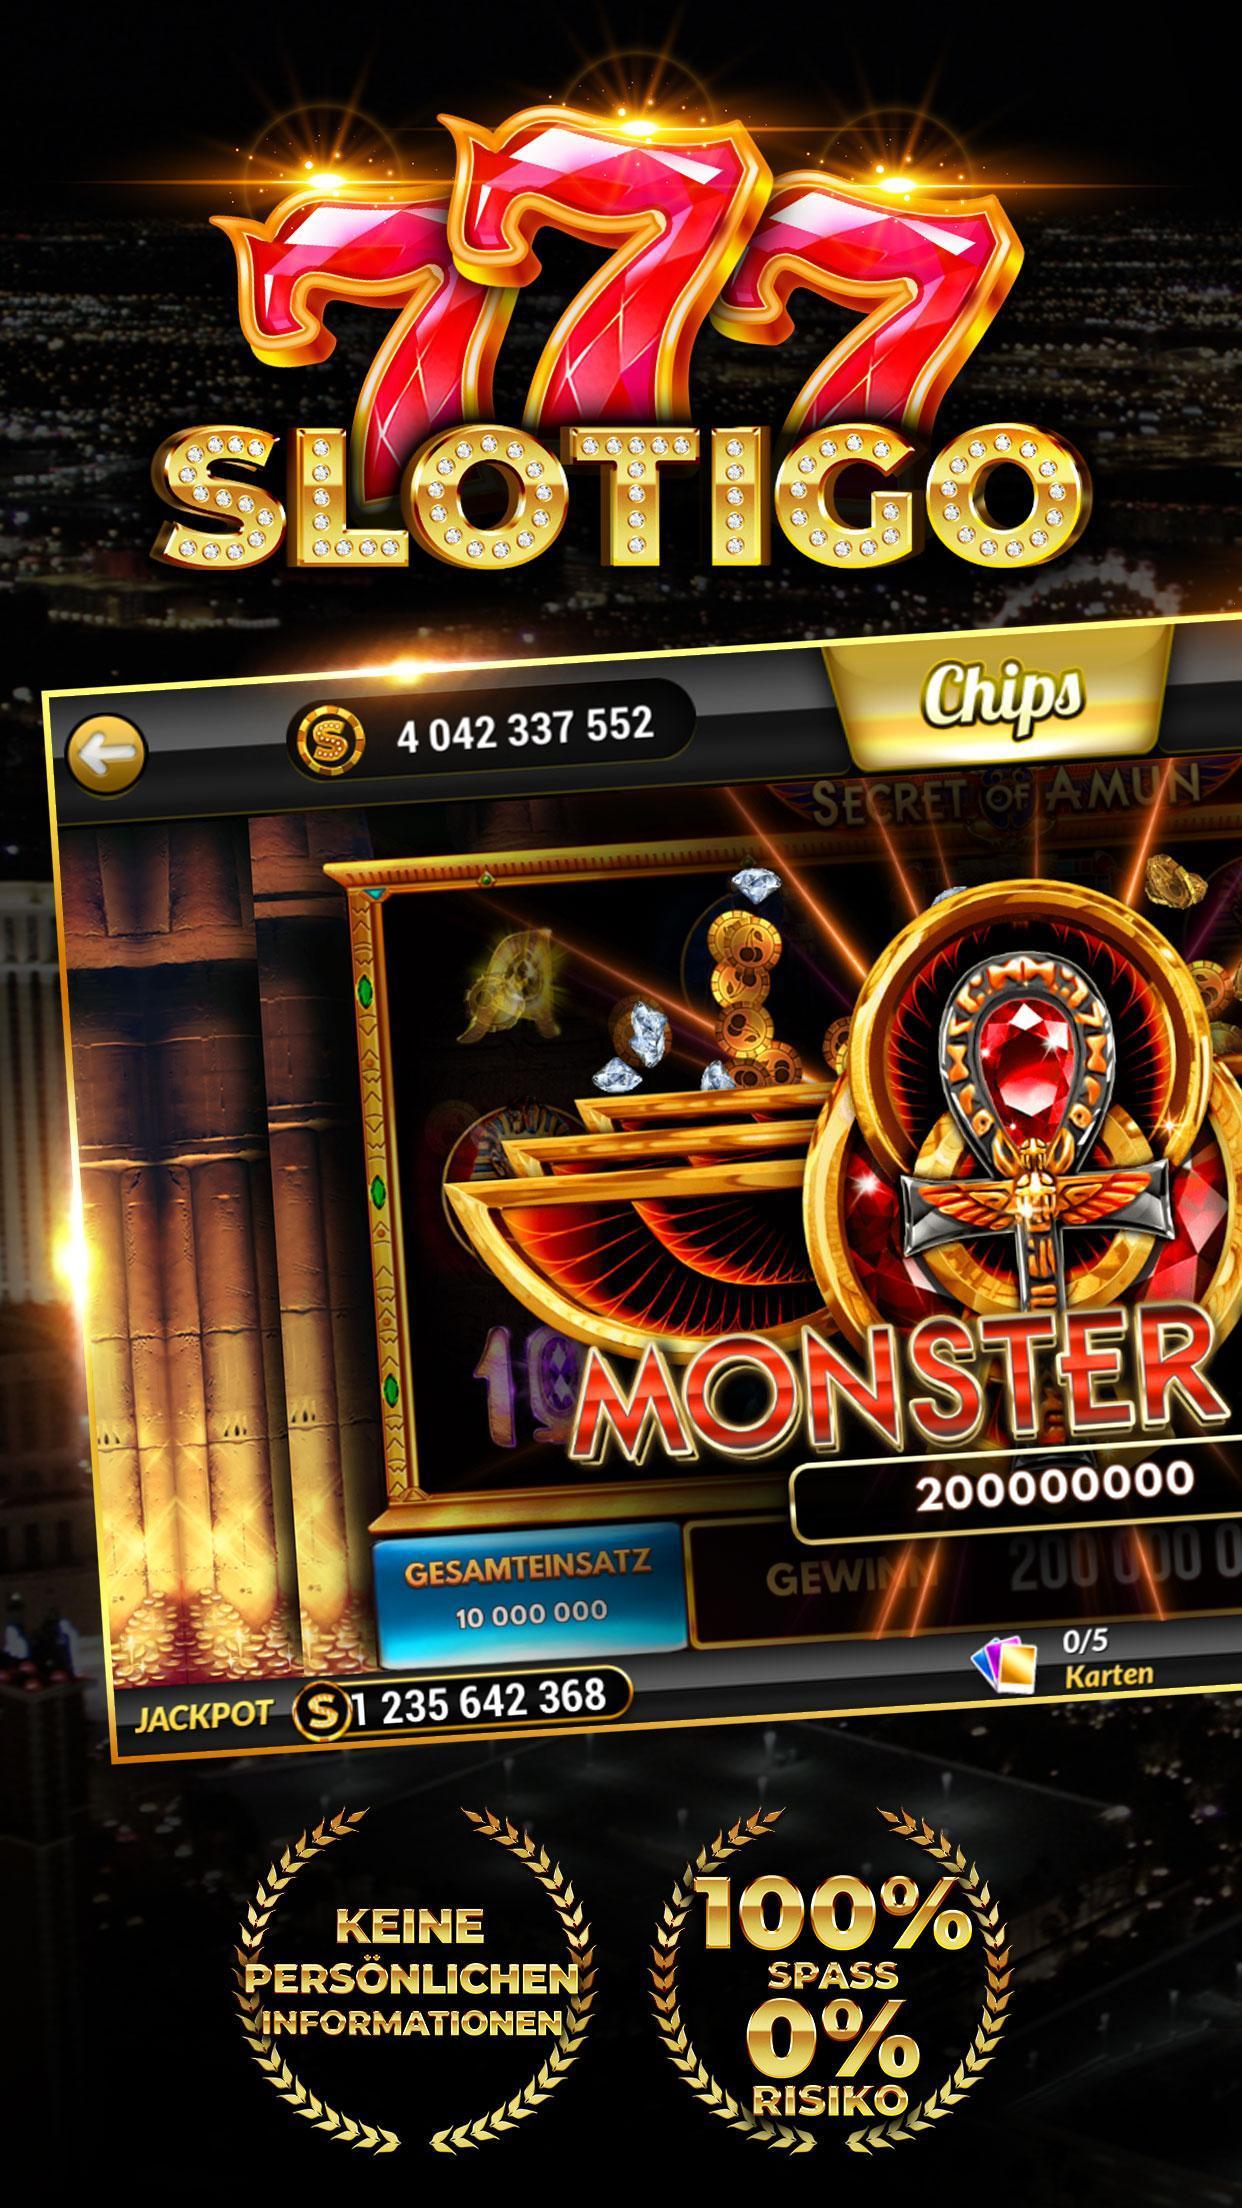 Slotigo Online-Casino, Spielautomaten & Jackpots 4.11.11 Screenshot 1